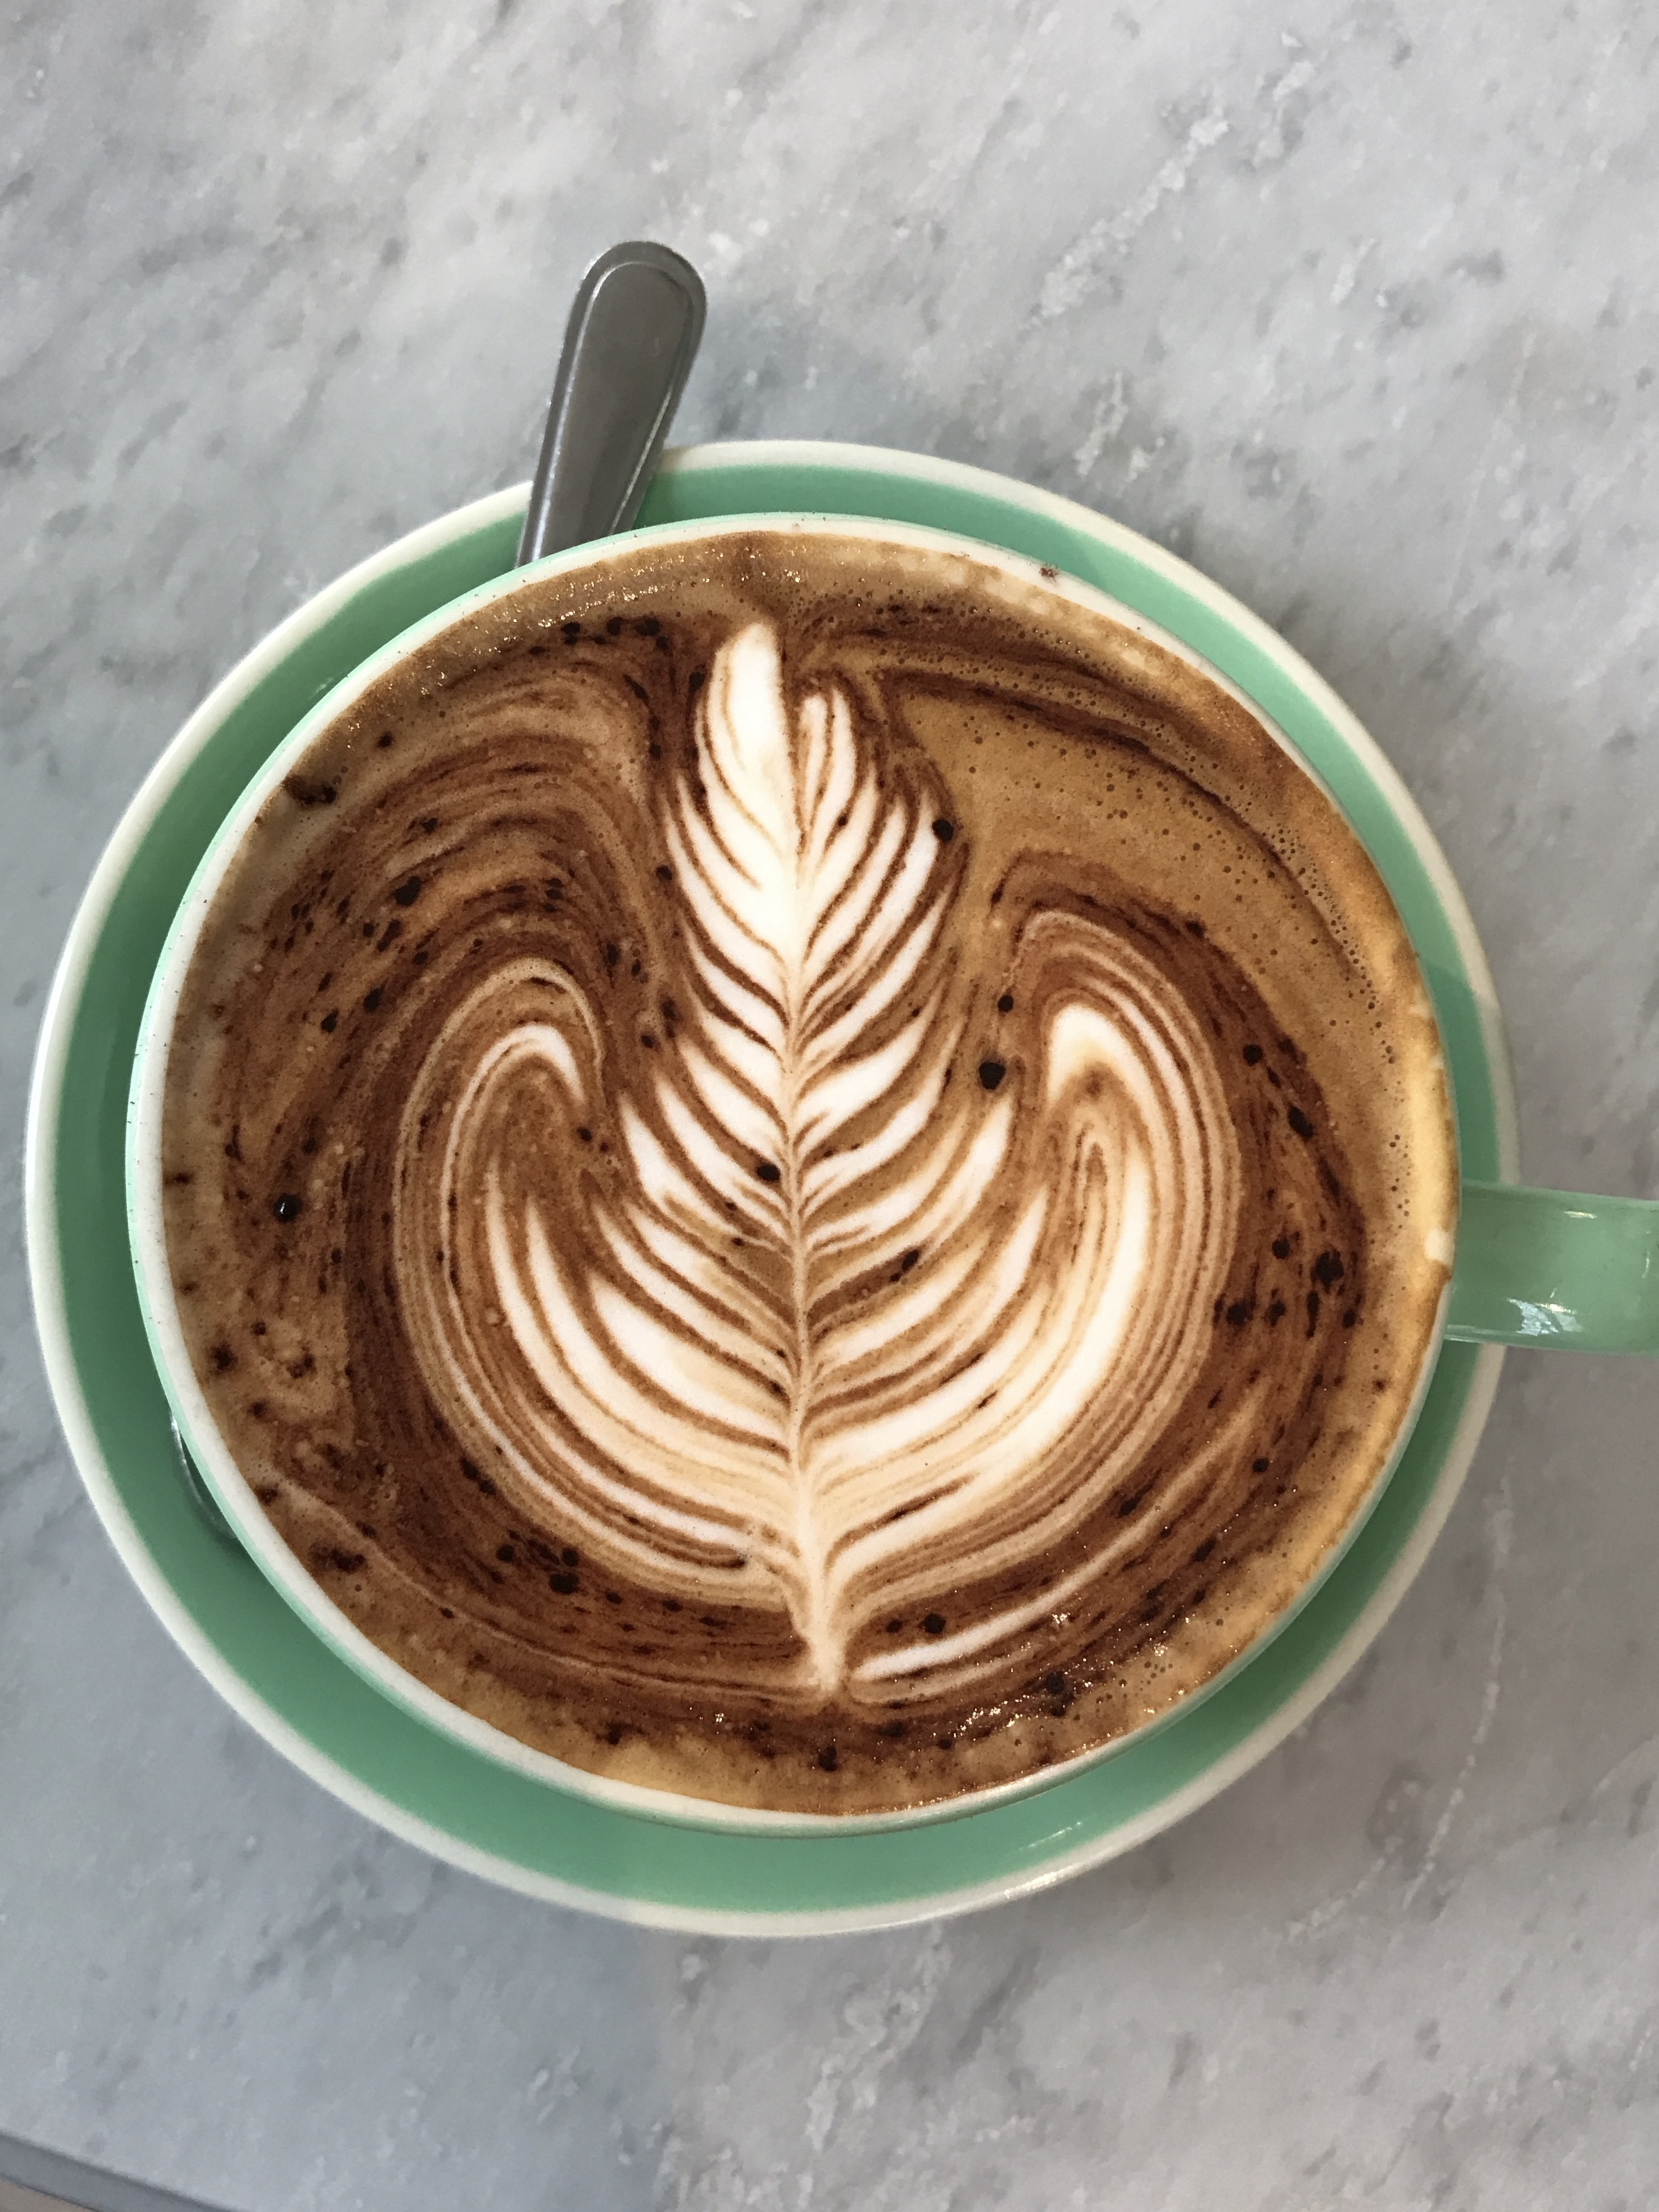 lolas-espresso.jpg